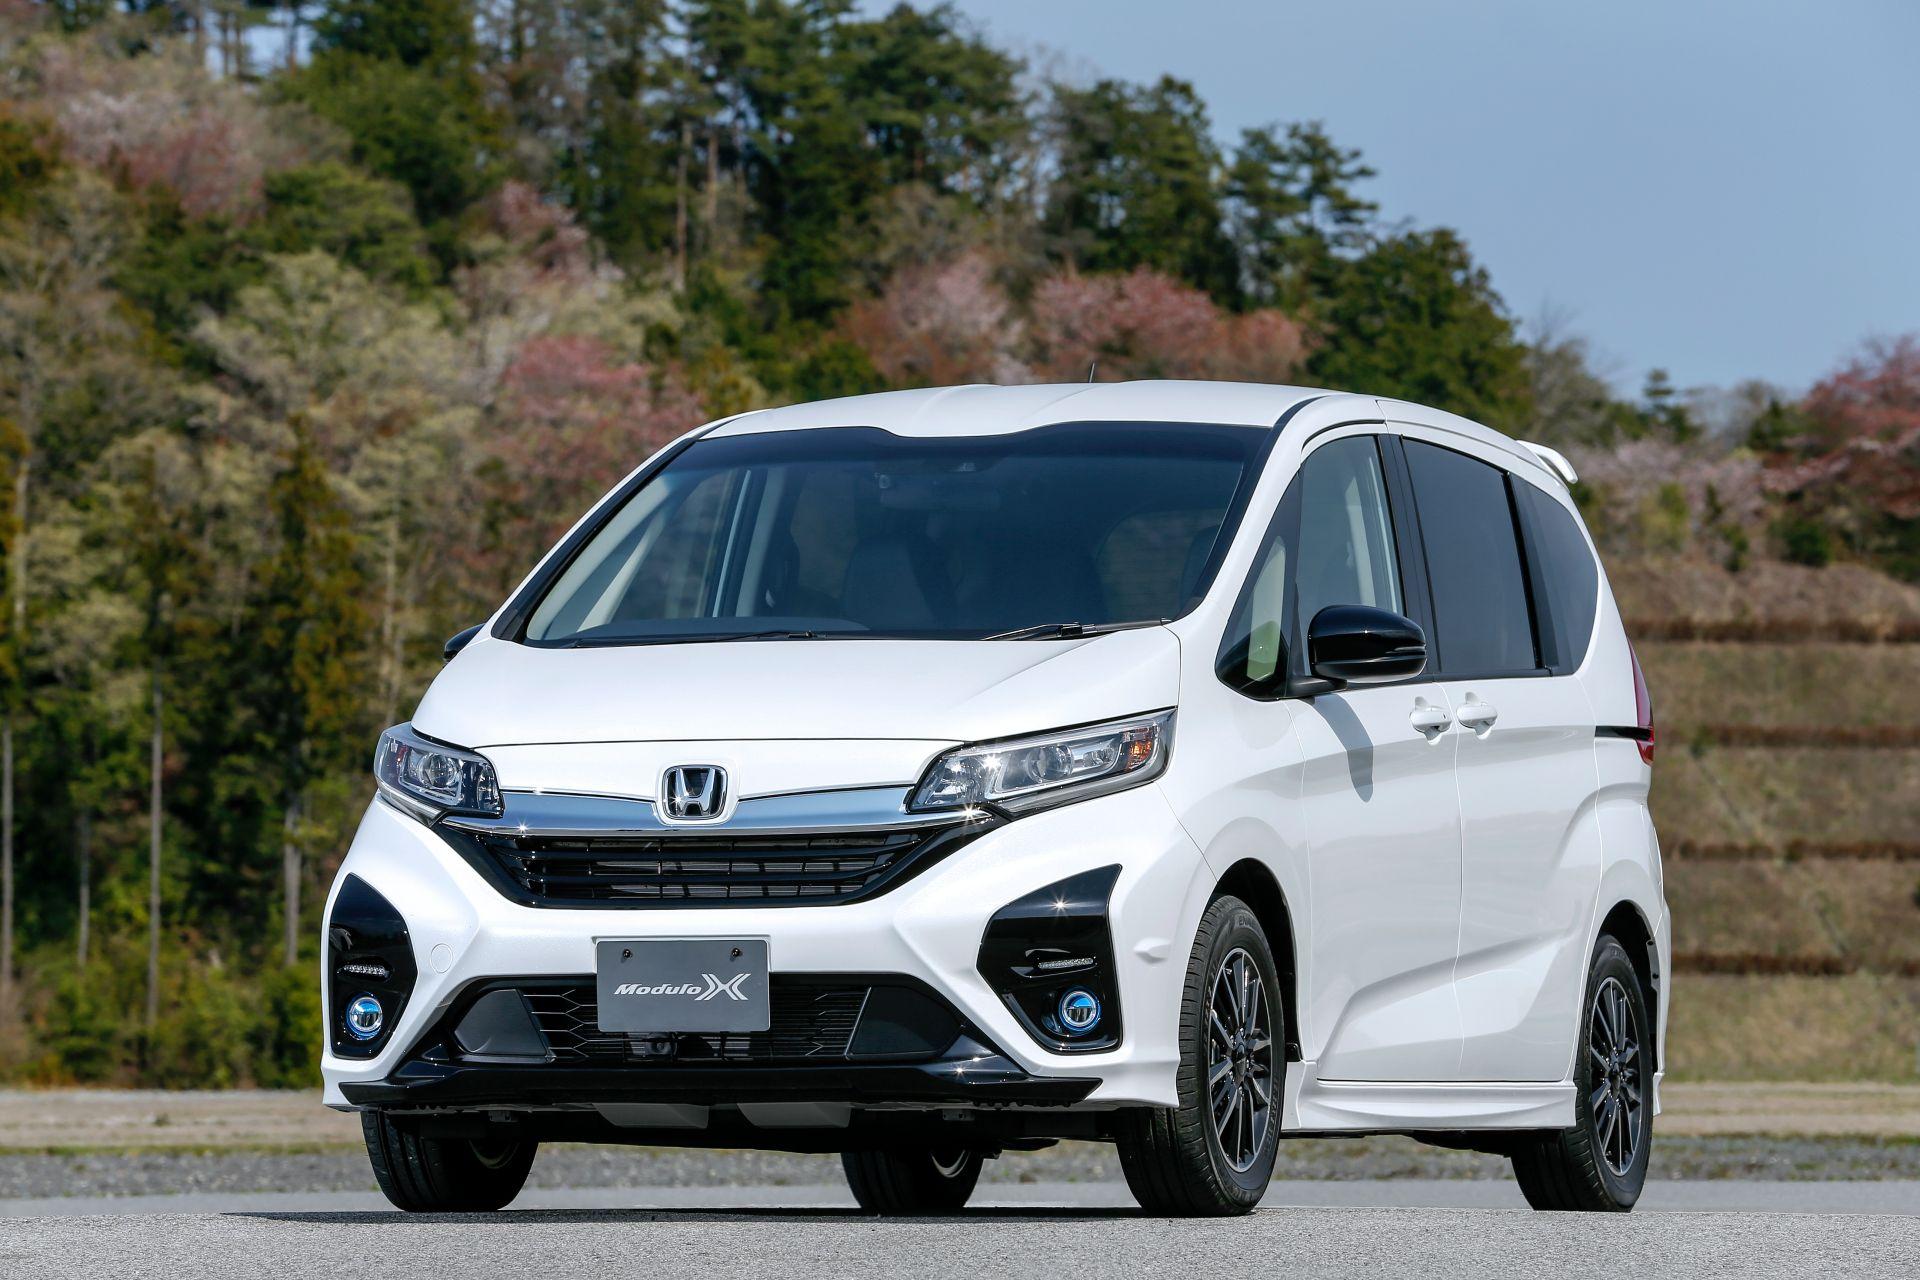 Honda-Freed-Modulo-X-Facelift-2020-12